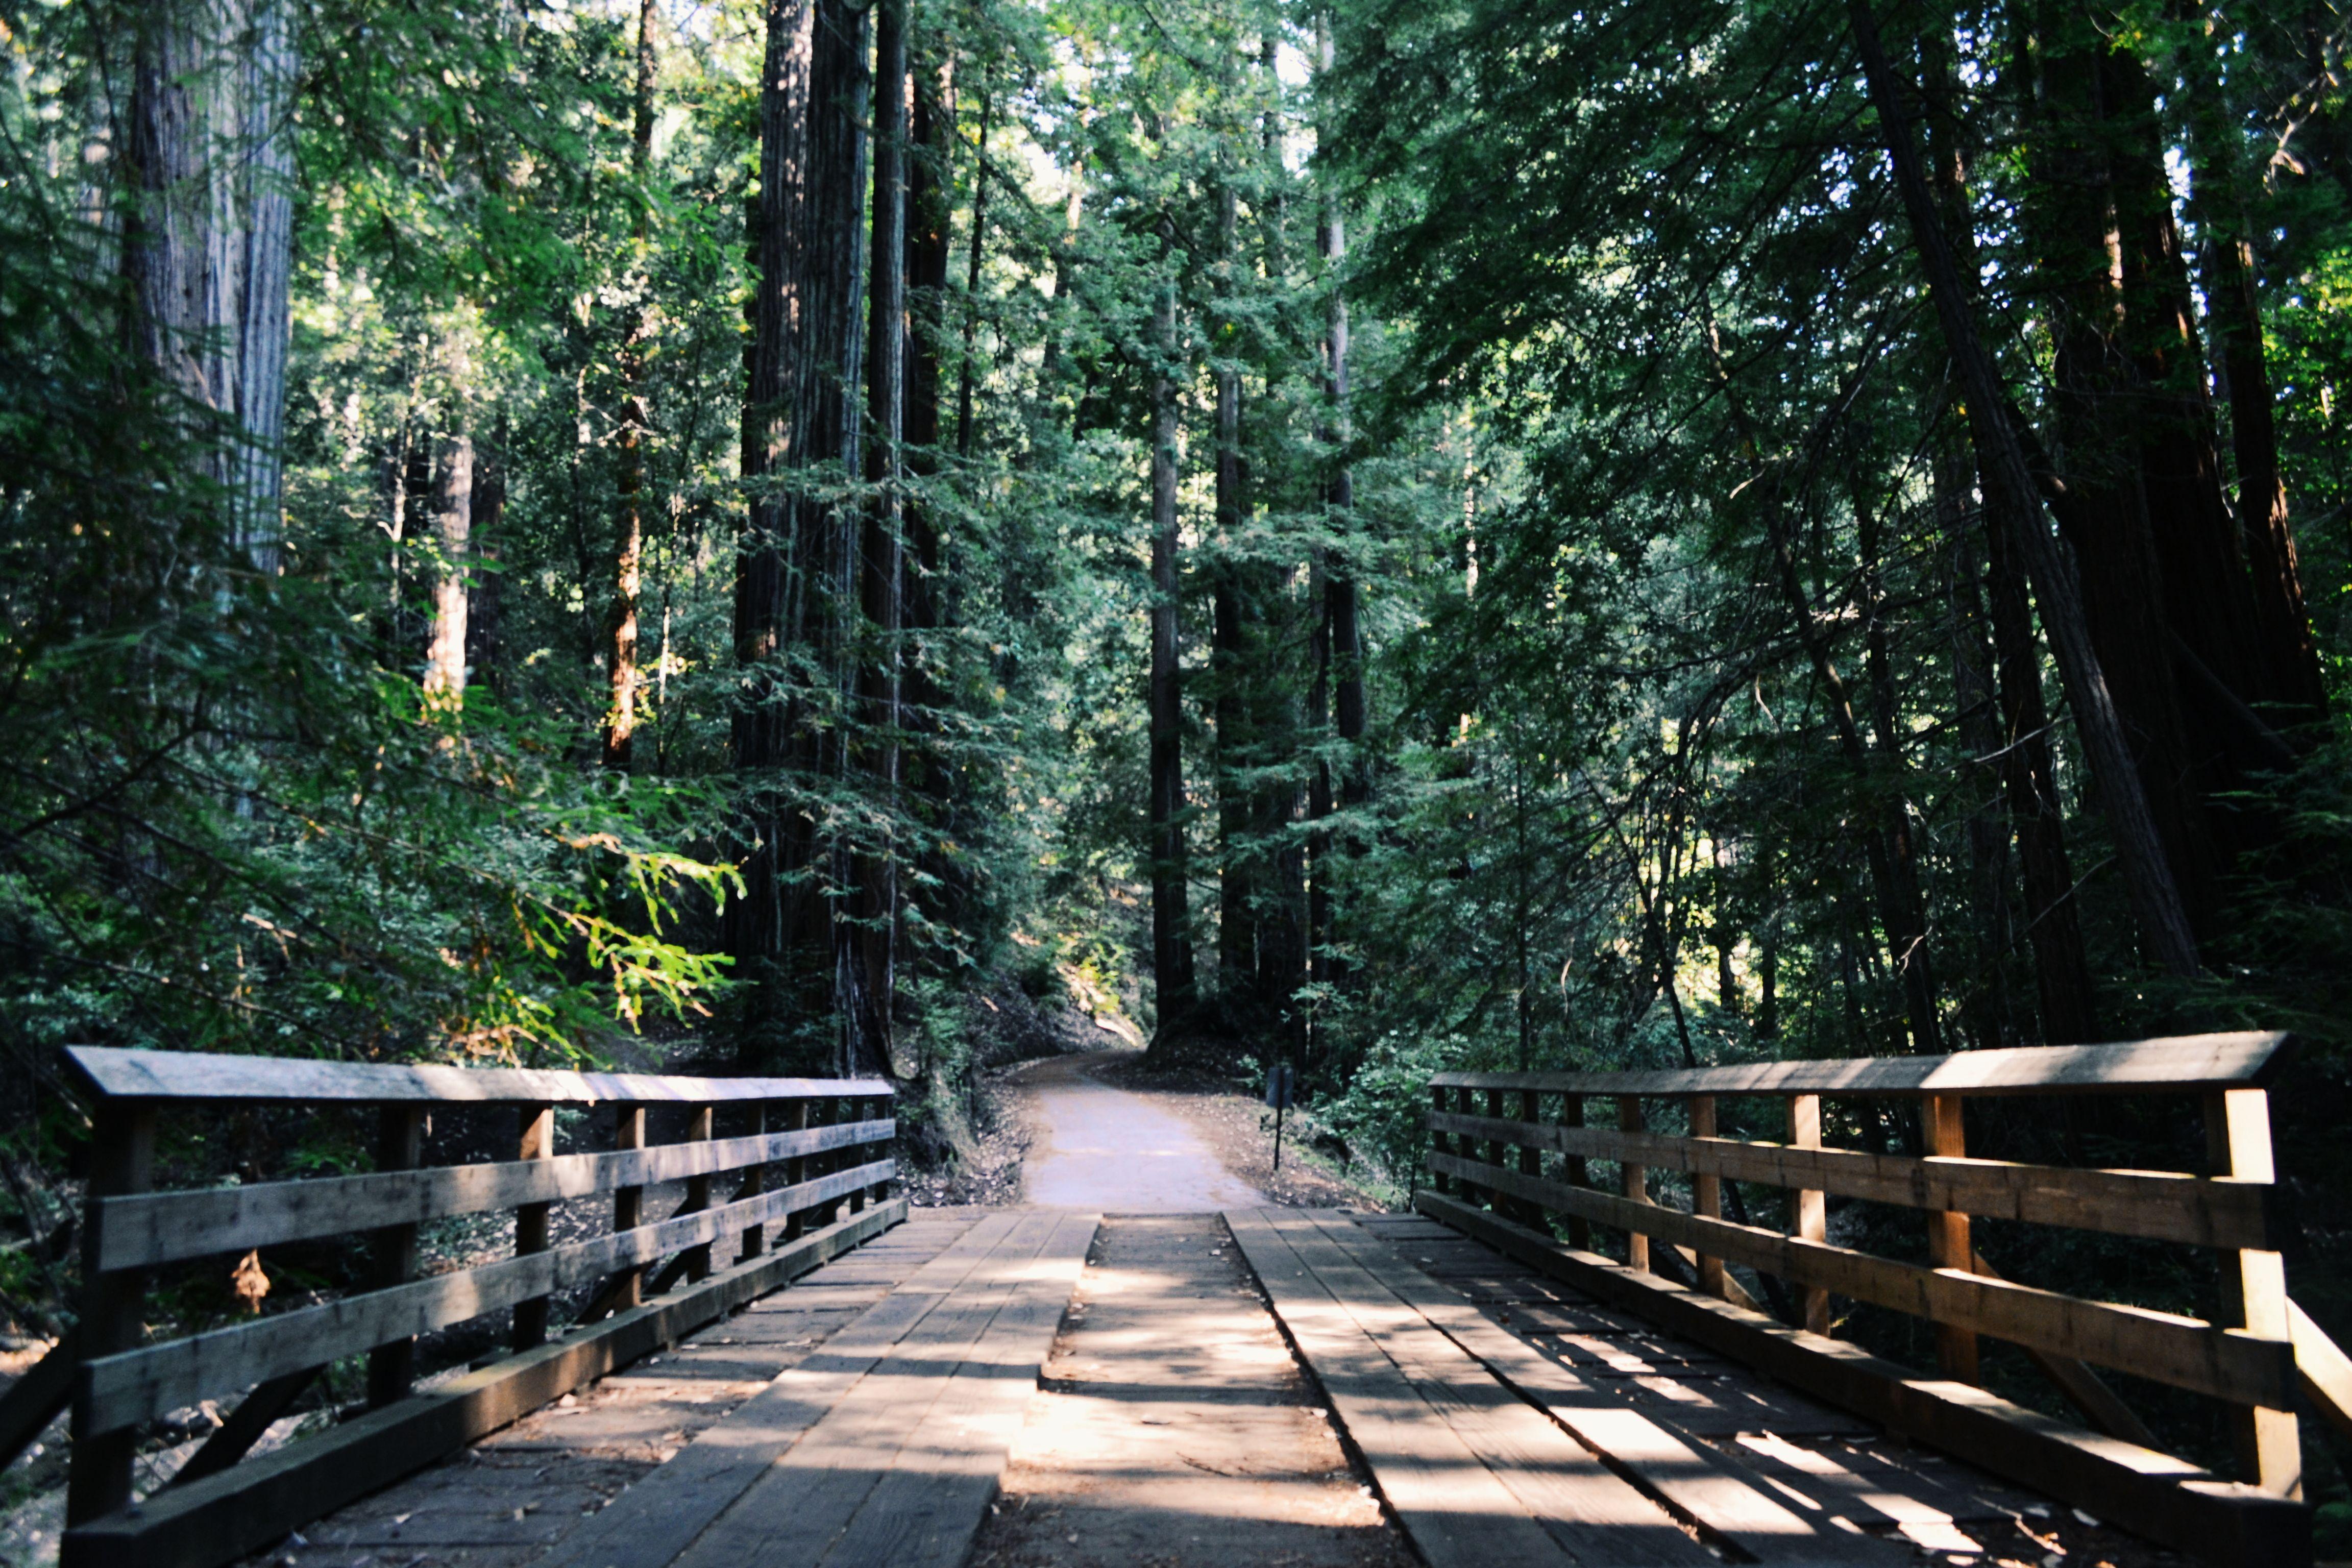 A bridge is seen among tall trees.